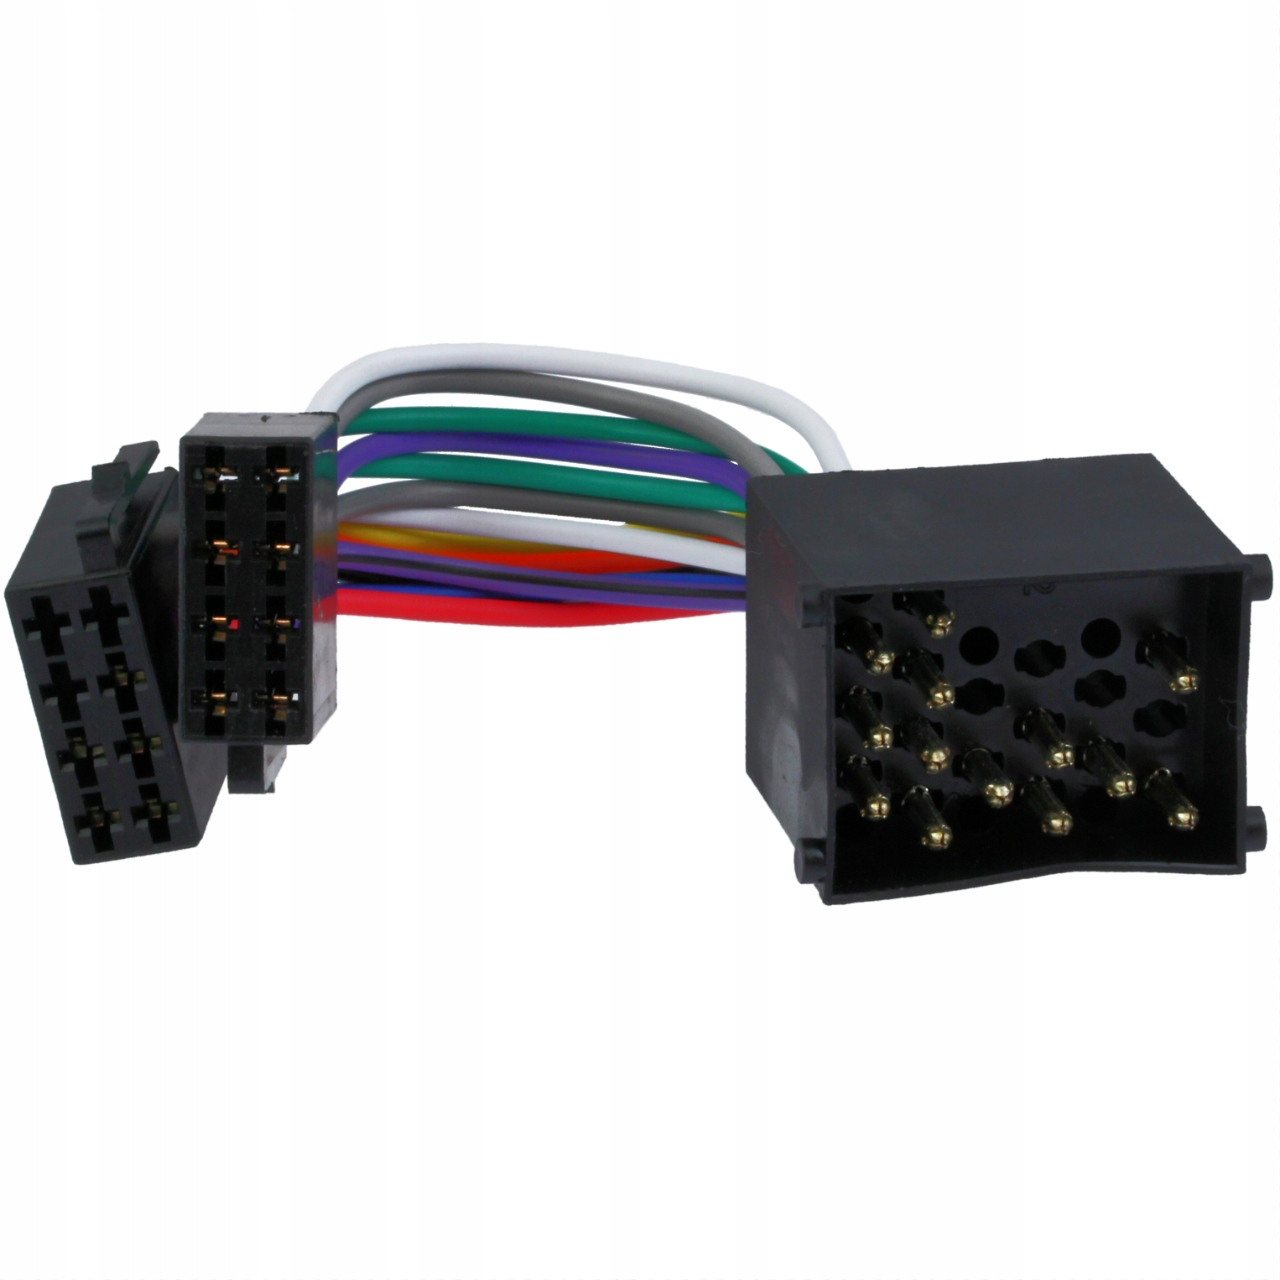 модуль адаптер адаптер iso радио bmw 3 e36 e46